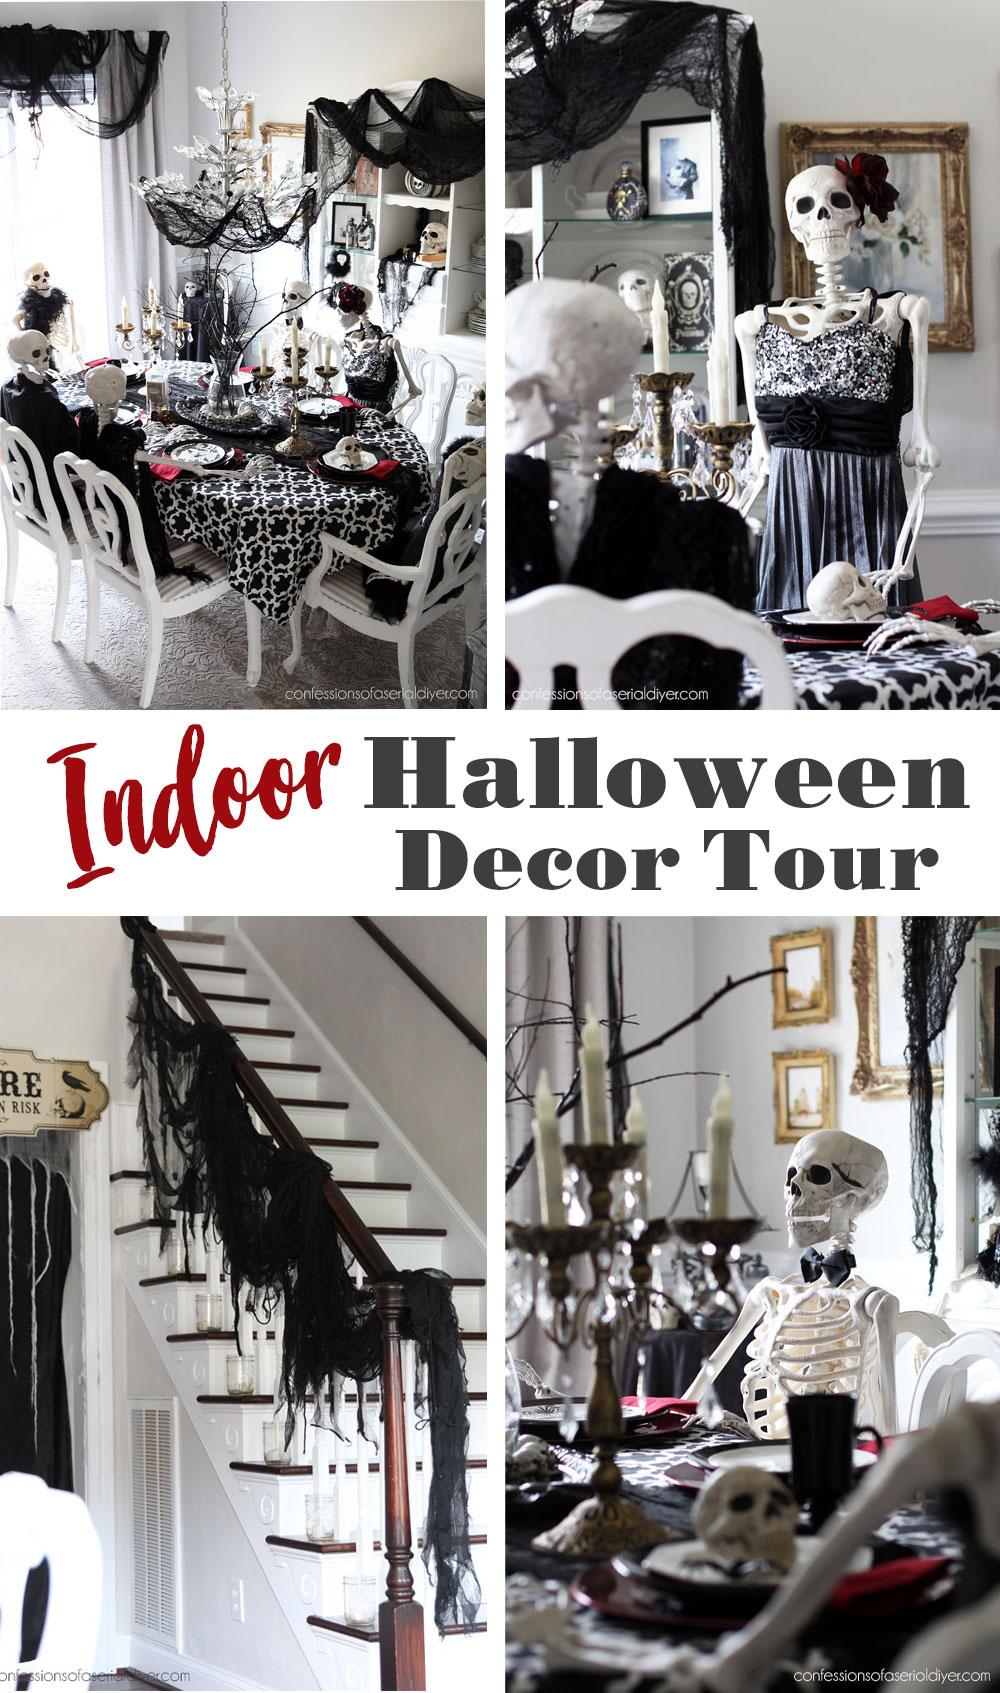 Indoor Halloween Decor: a Skeleton Dinner Party!